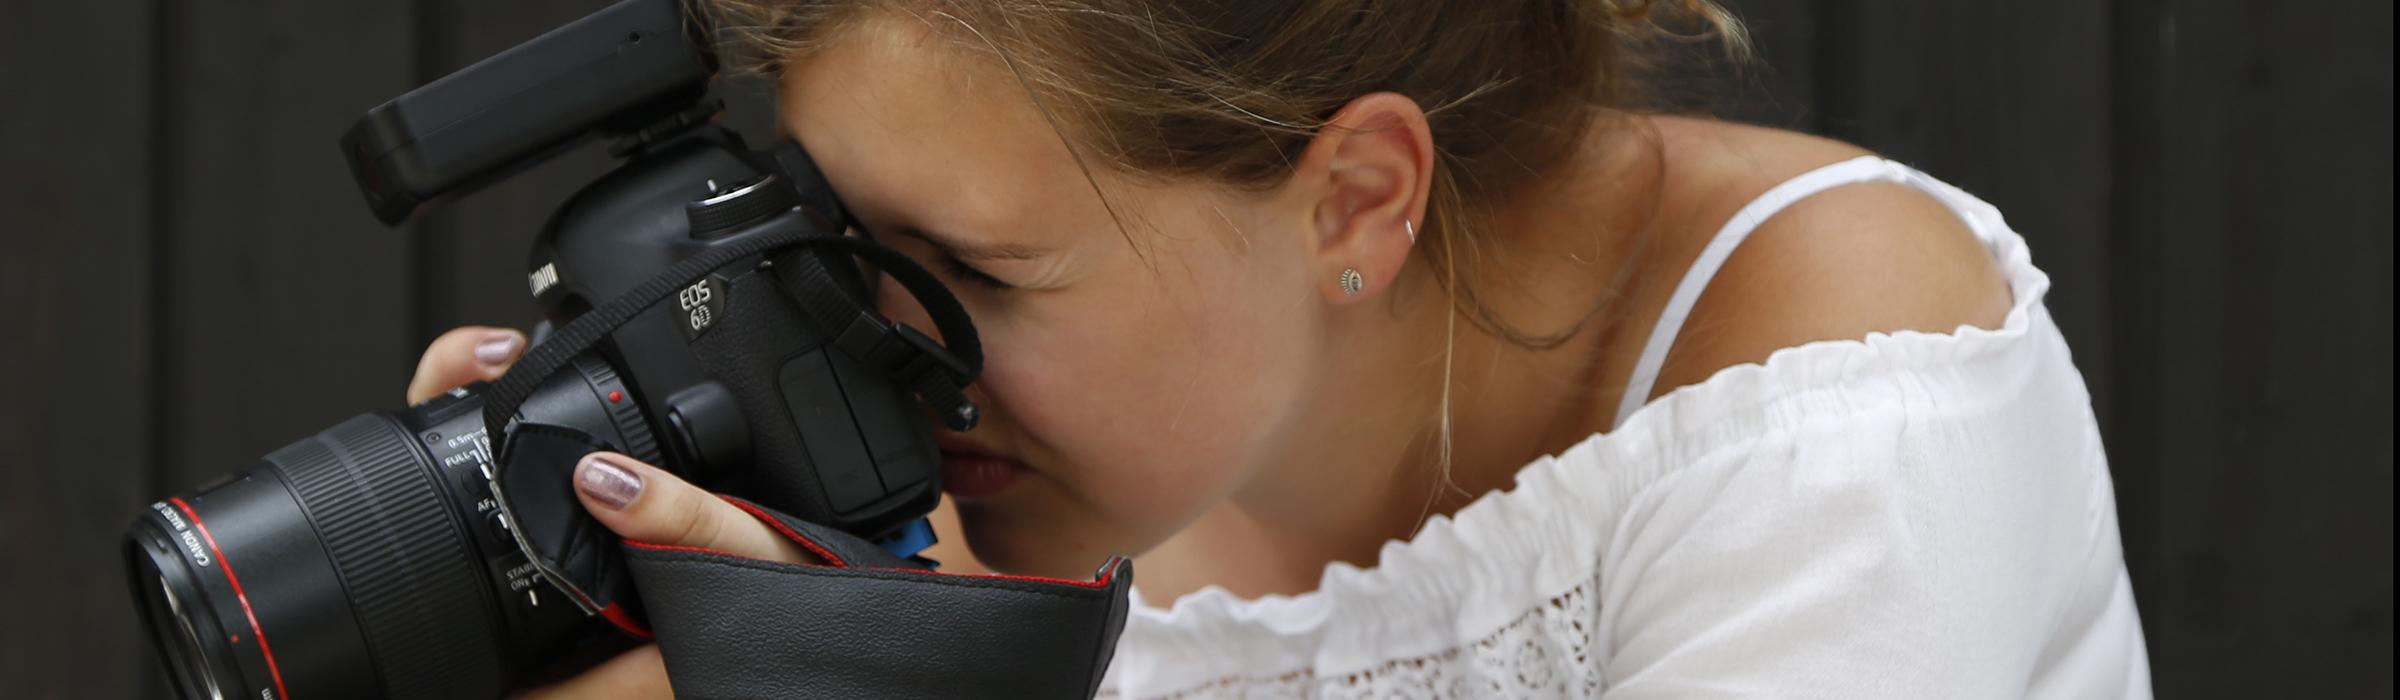 Julia-Pöller Fotografieren